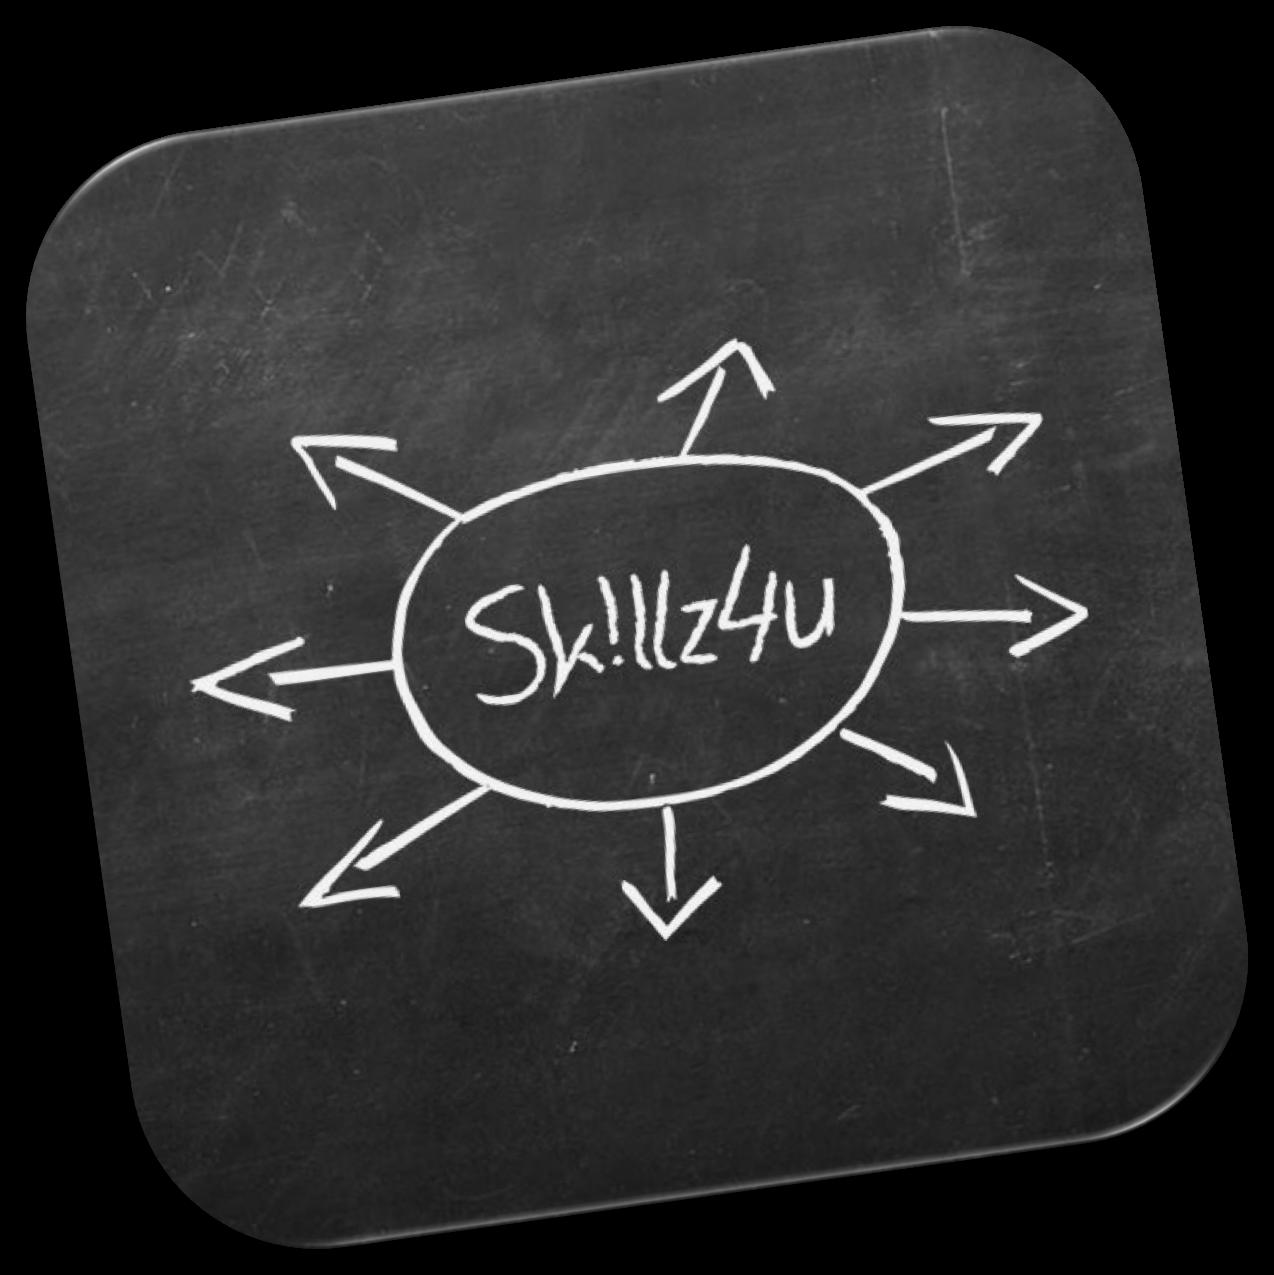 Skillz4u.nl